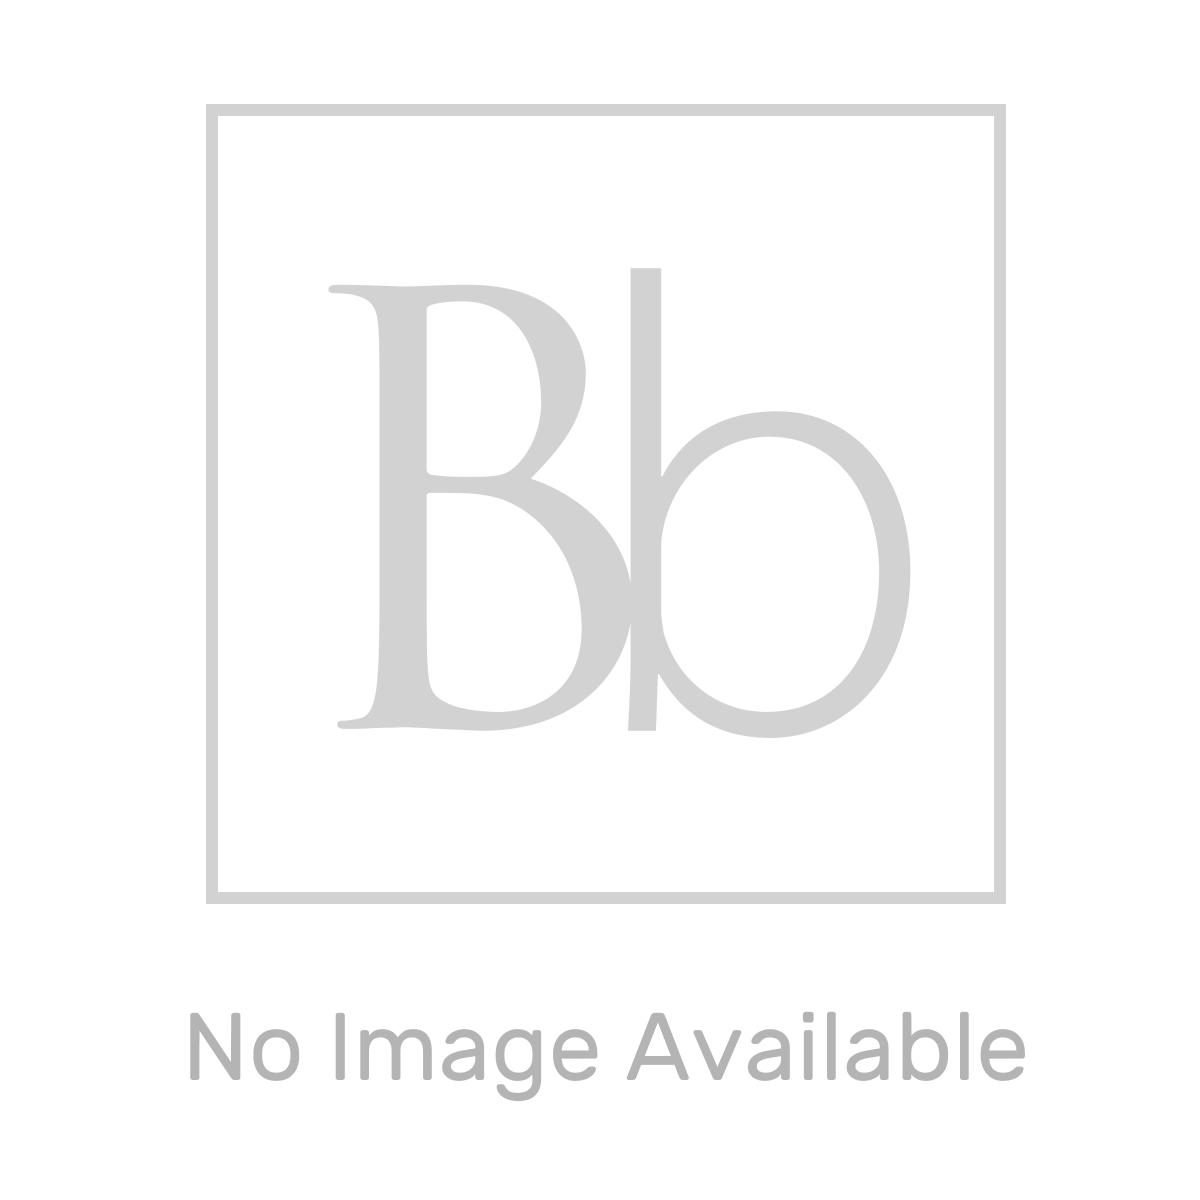 Aquadart Black Slate Shower Tray 1100 x 900 Dimension